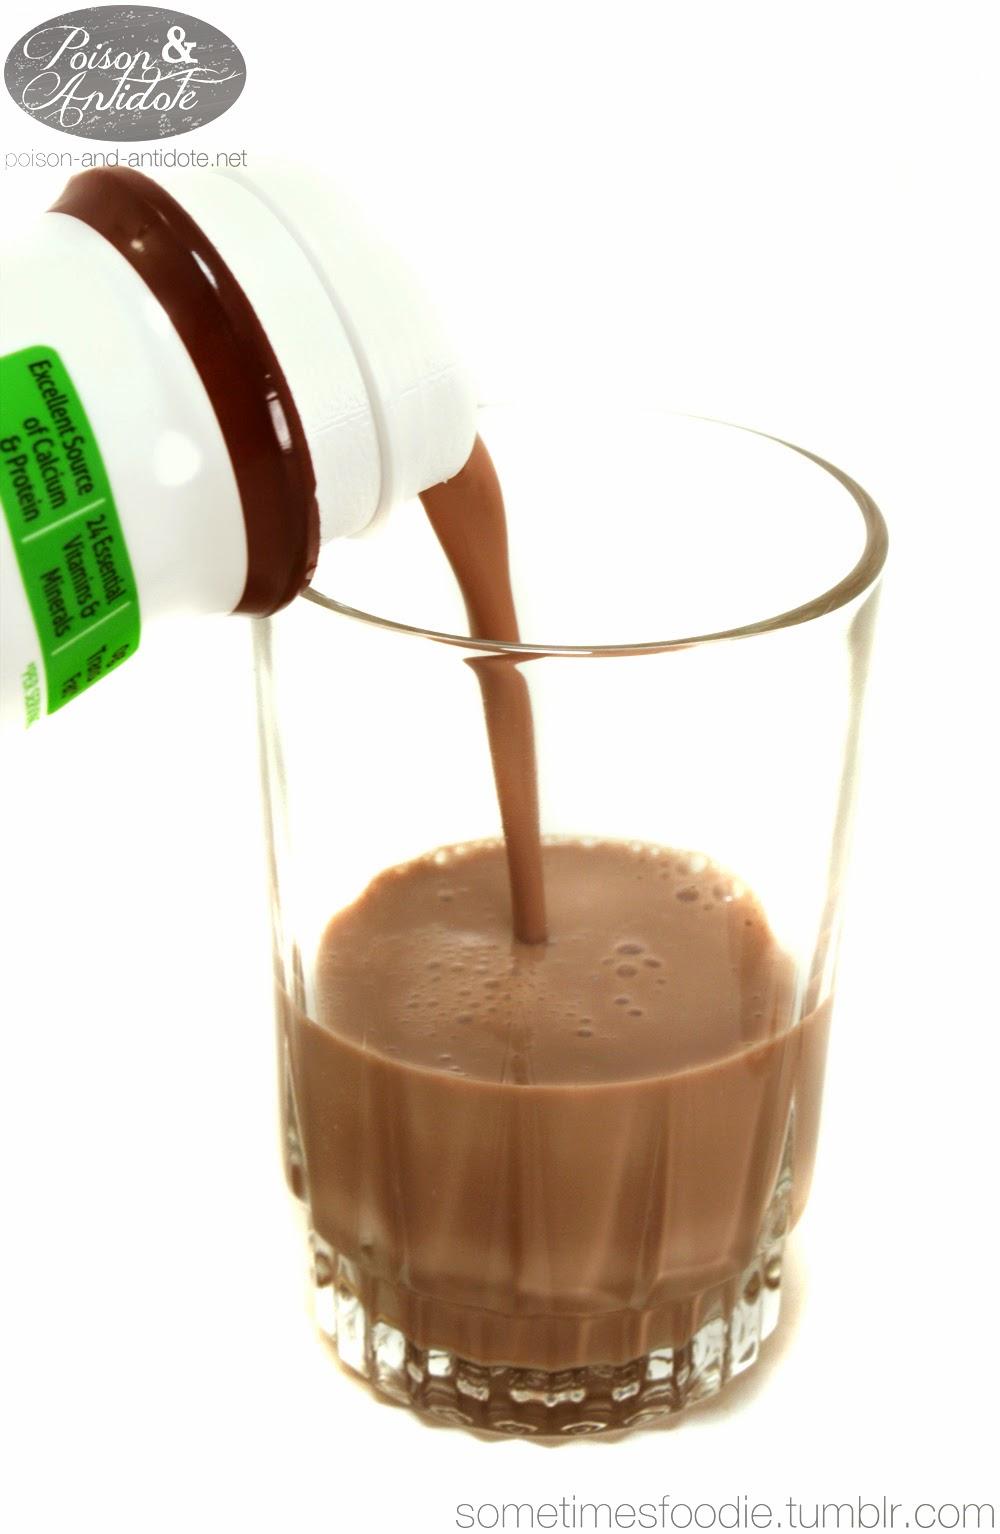 Can increase hcg weight loss program dr simeons